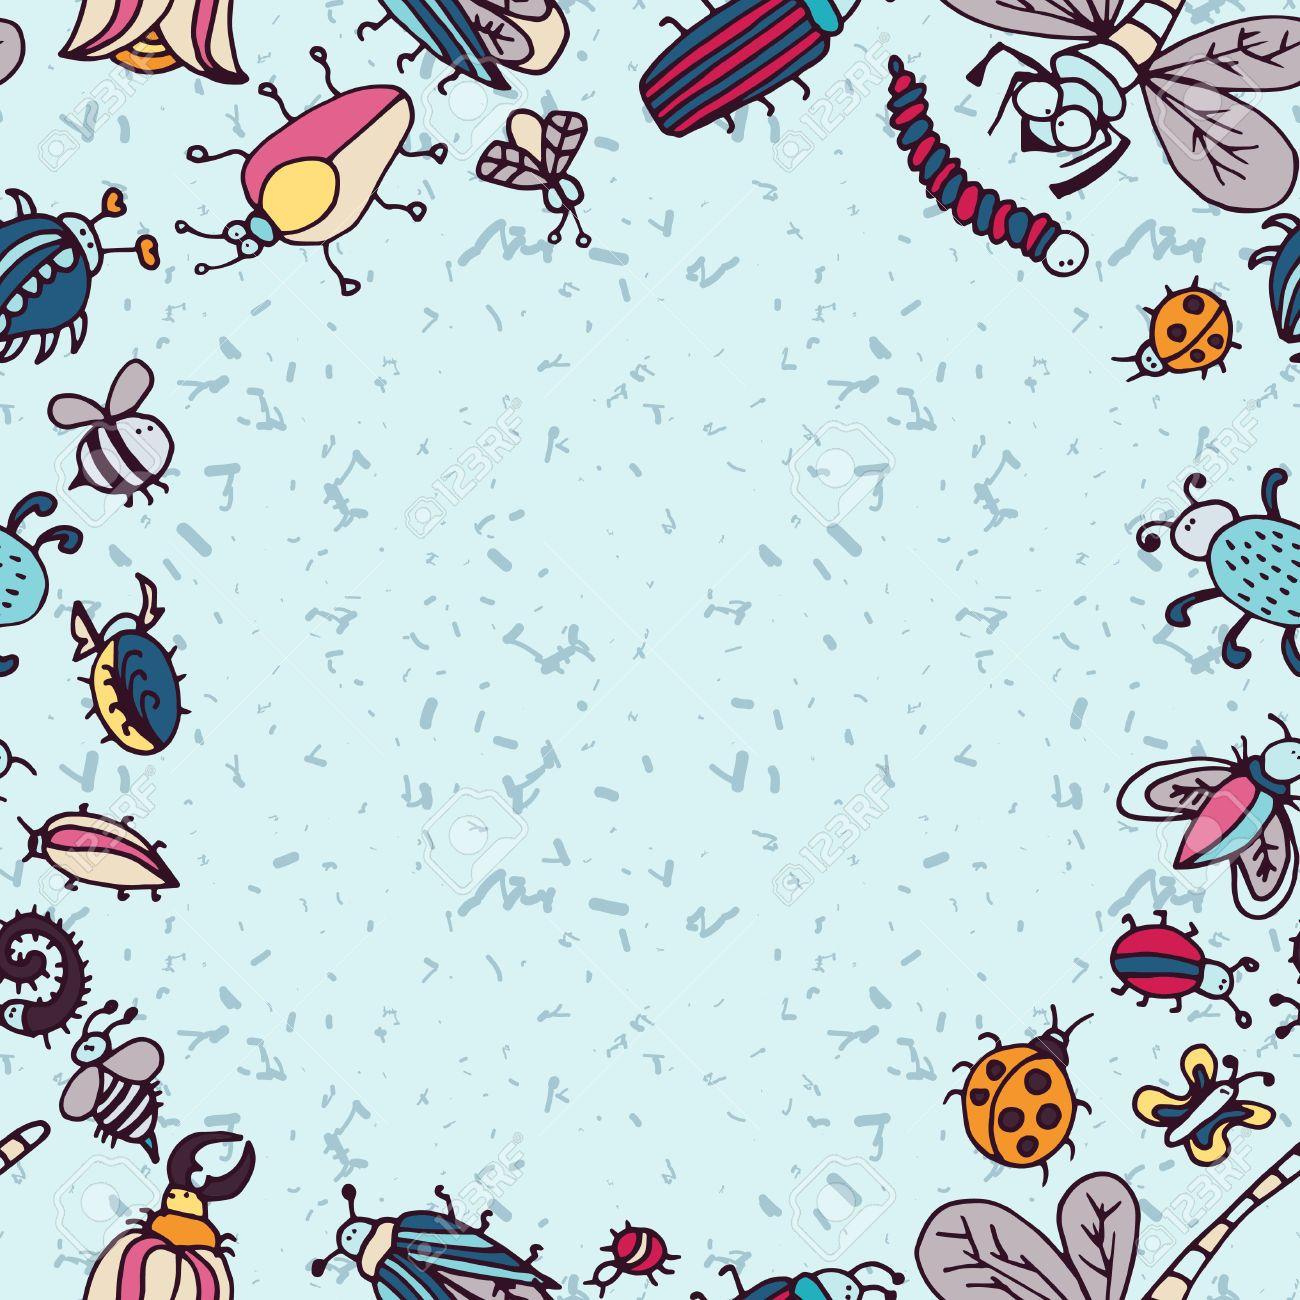 cute bug border Google Search Border, Cute, Cards